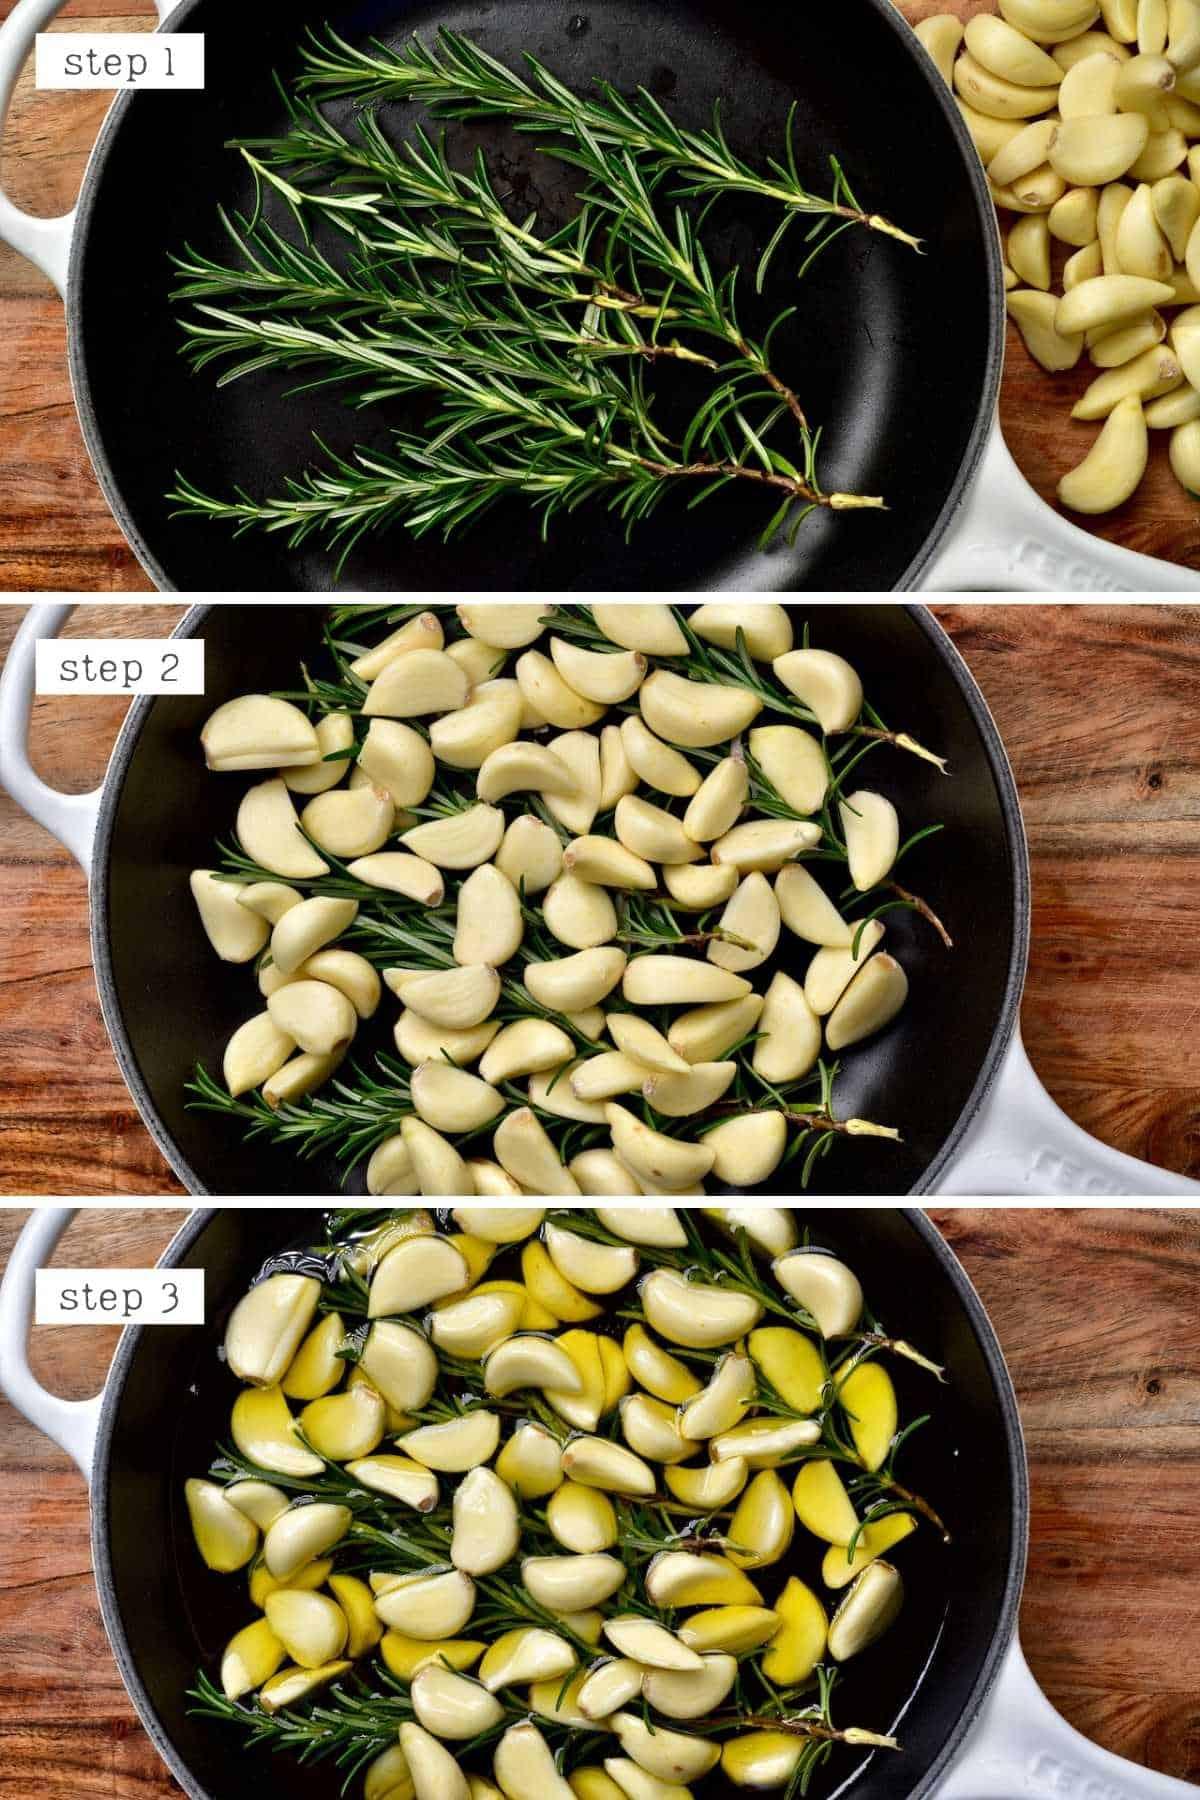 Steps for preparing garlic confit